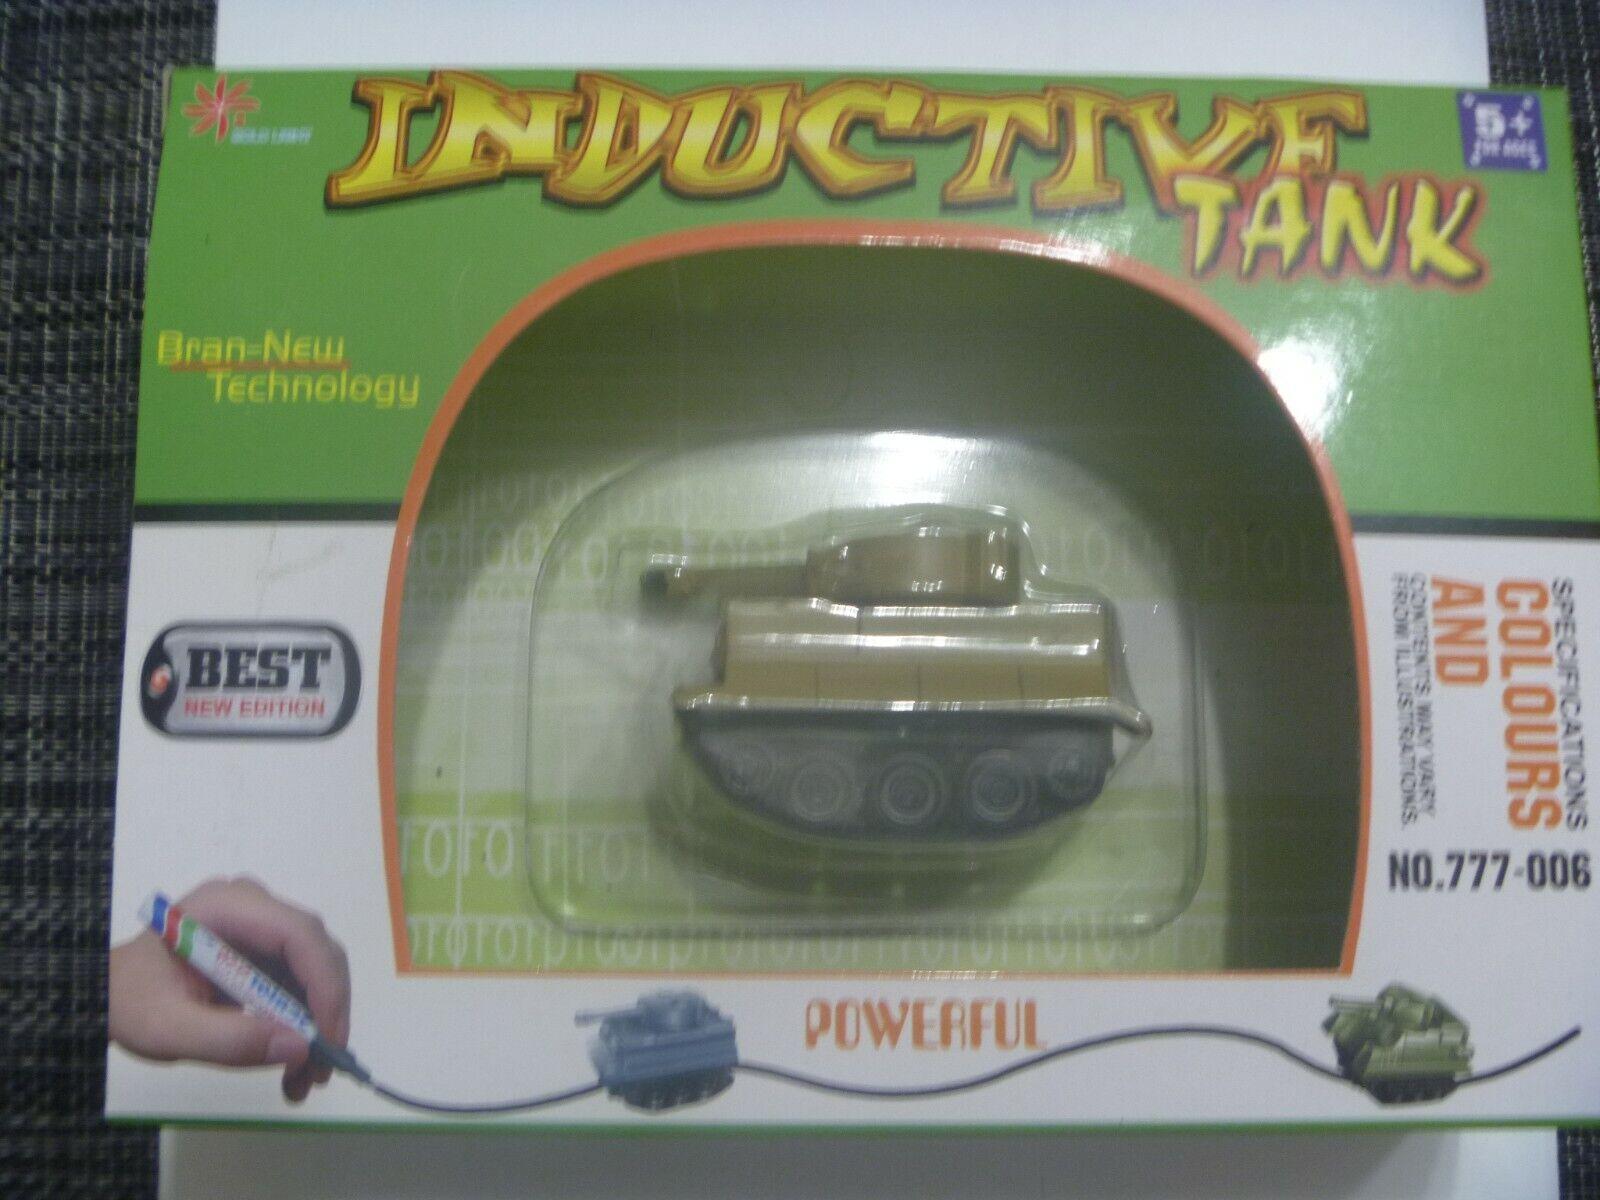 YoCosii Mini Magic Trucks Toy Induction Vehicle Model Follow Black Line Inductive Truck Toy Learning /& Fun for Kids Imaginative Educative